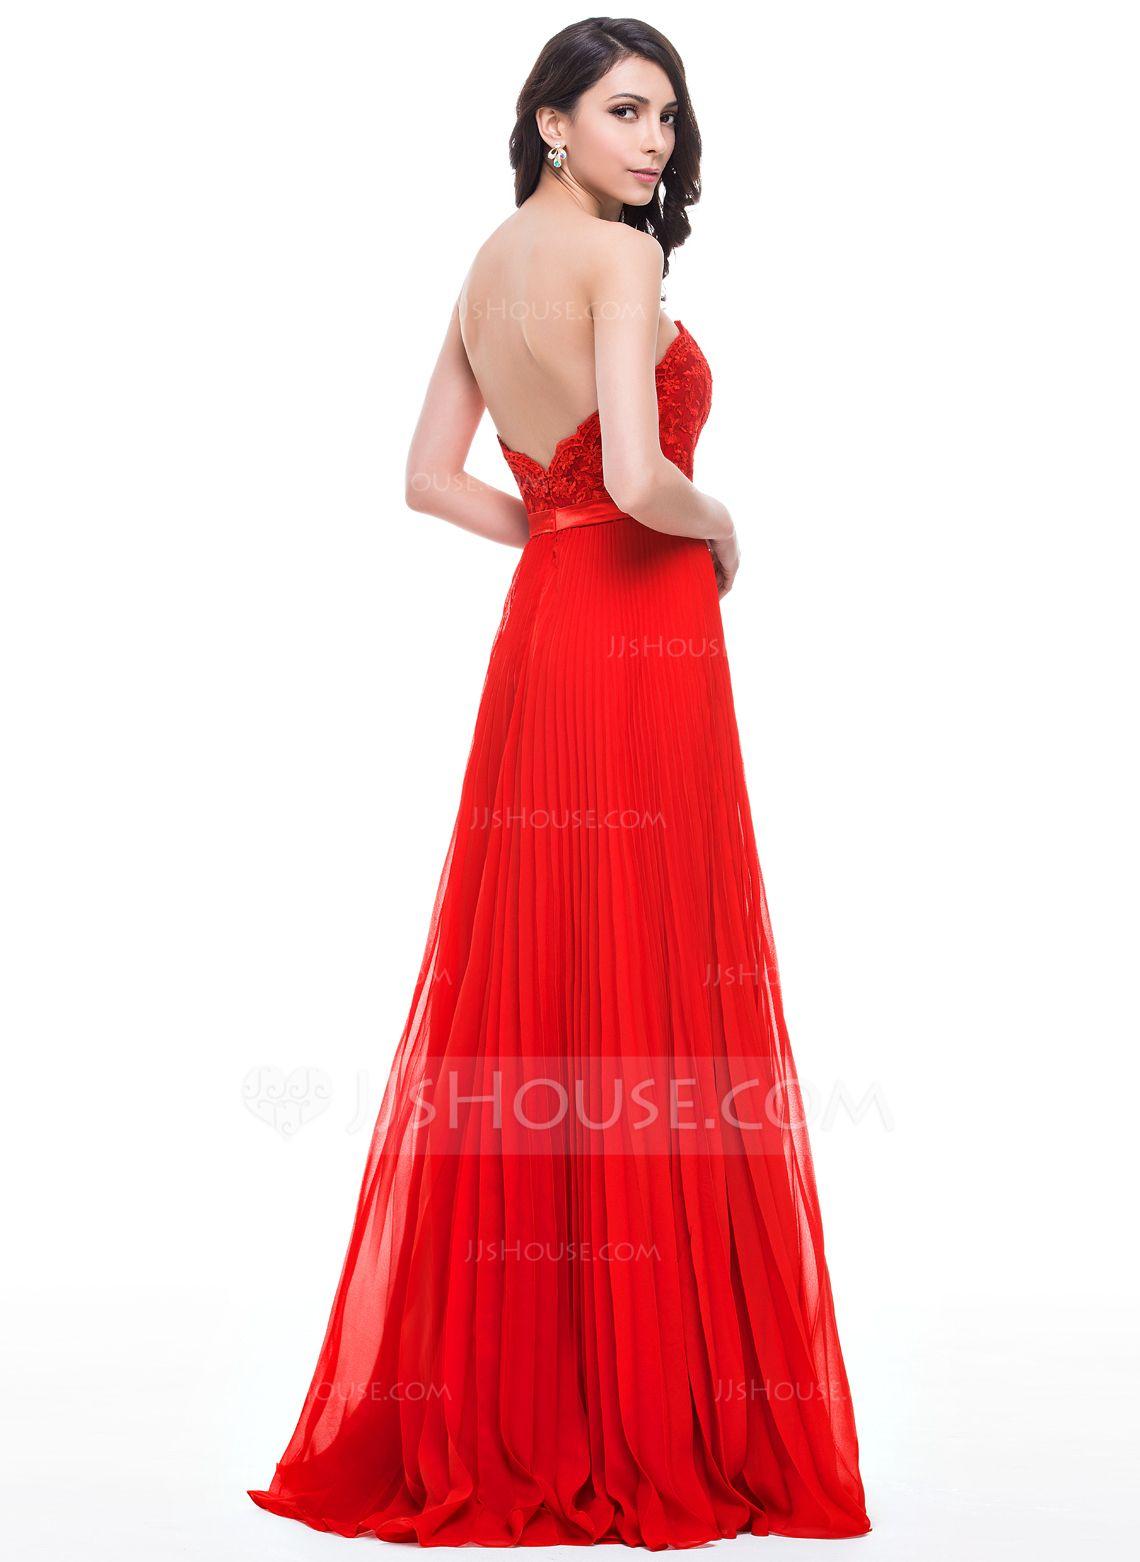 Alineprincess sweetheart floorlength chiffon lace prom dresses